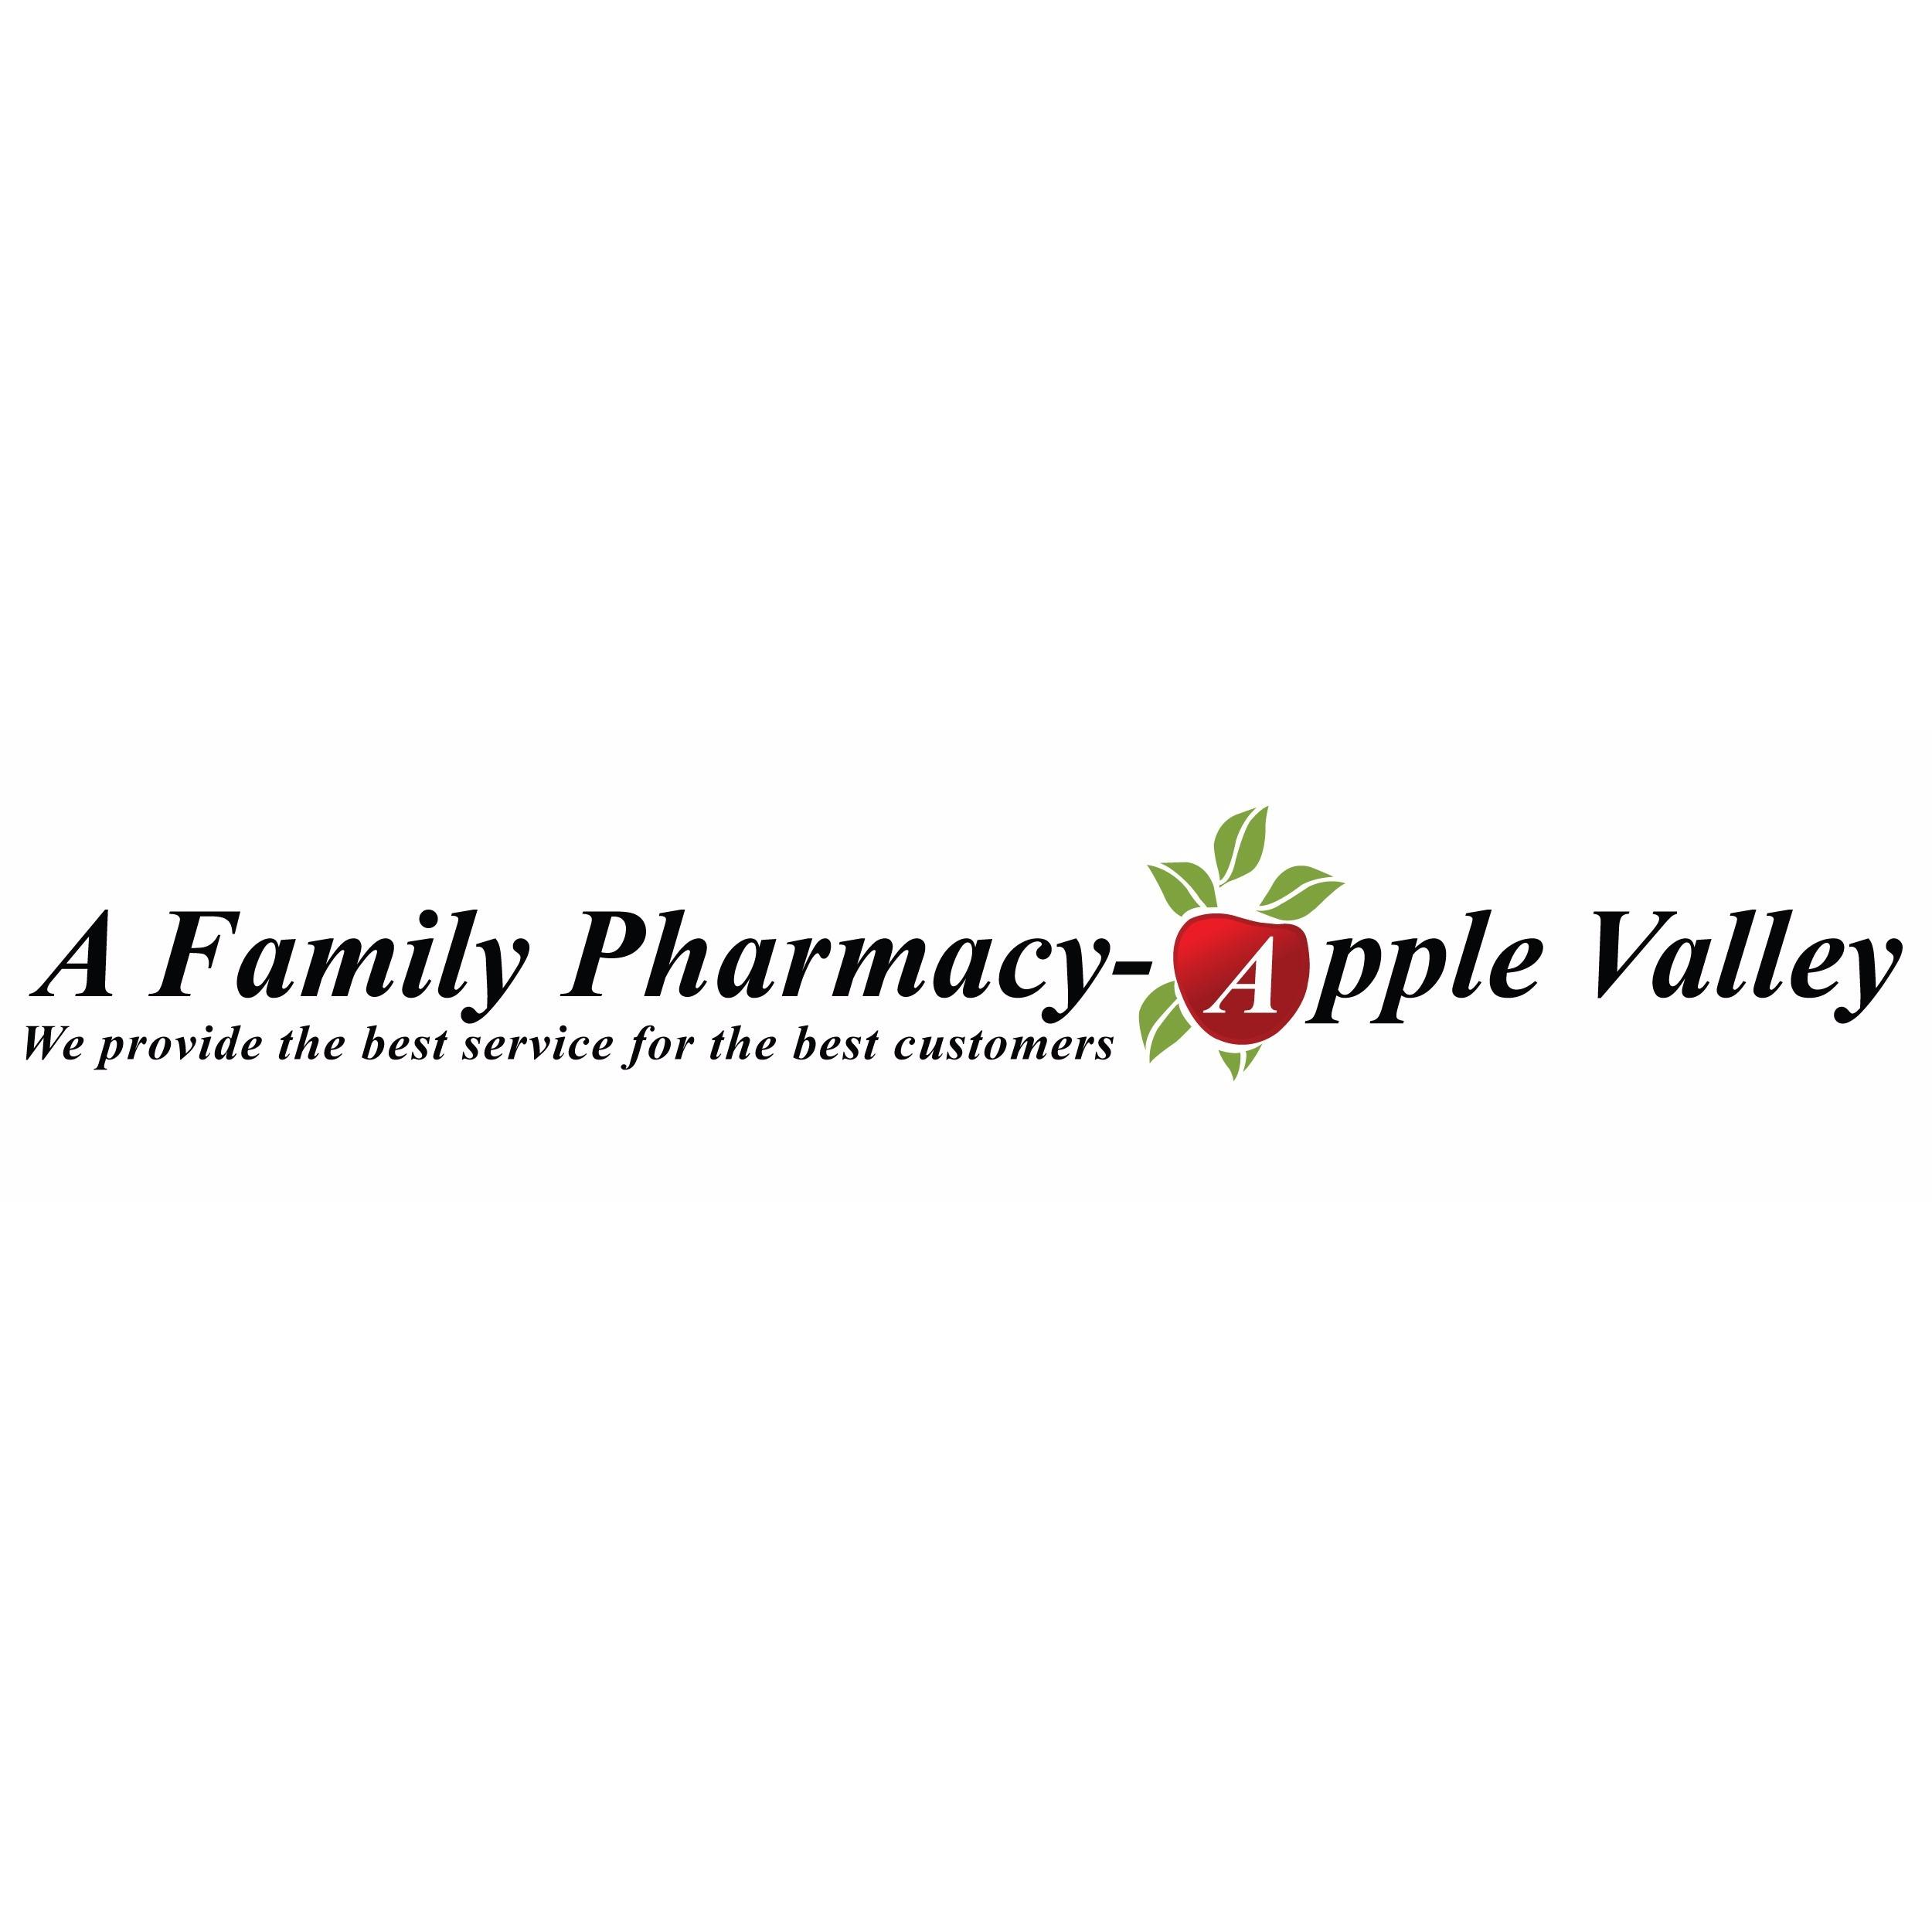 Pharmacy in CA Apple Valley 92307 A Family Pharmacy Apple Valley 15863 Kasota Rd  (760)242-5452